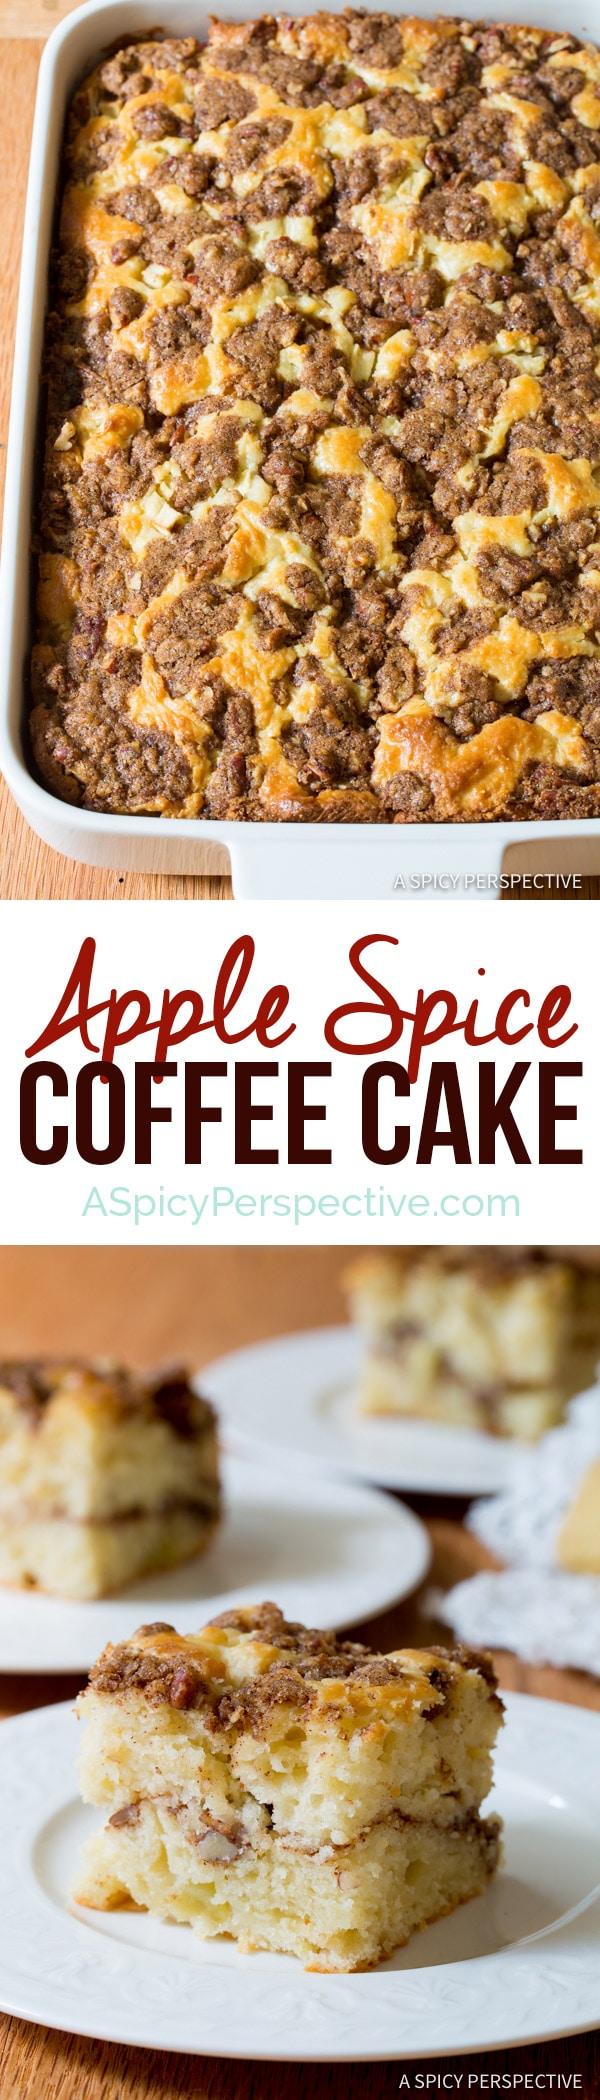 Apple Spice Coffee Cake   ASpicyPerspective.com